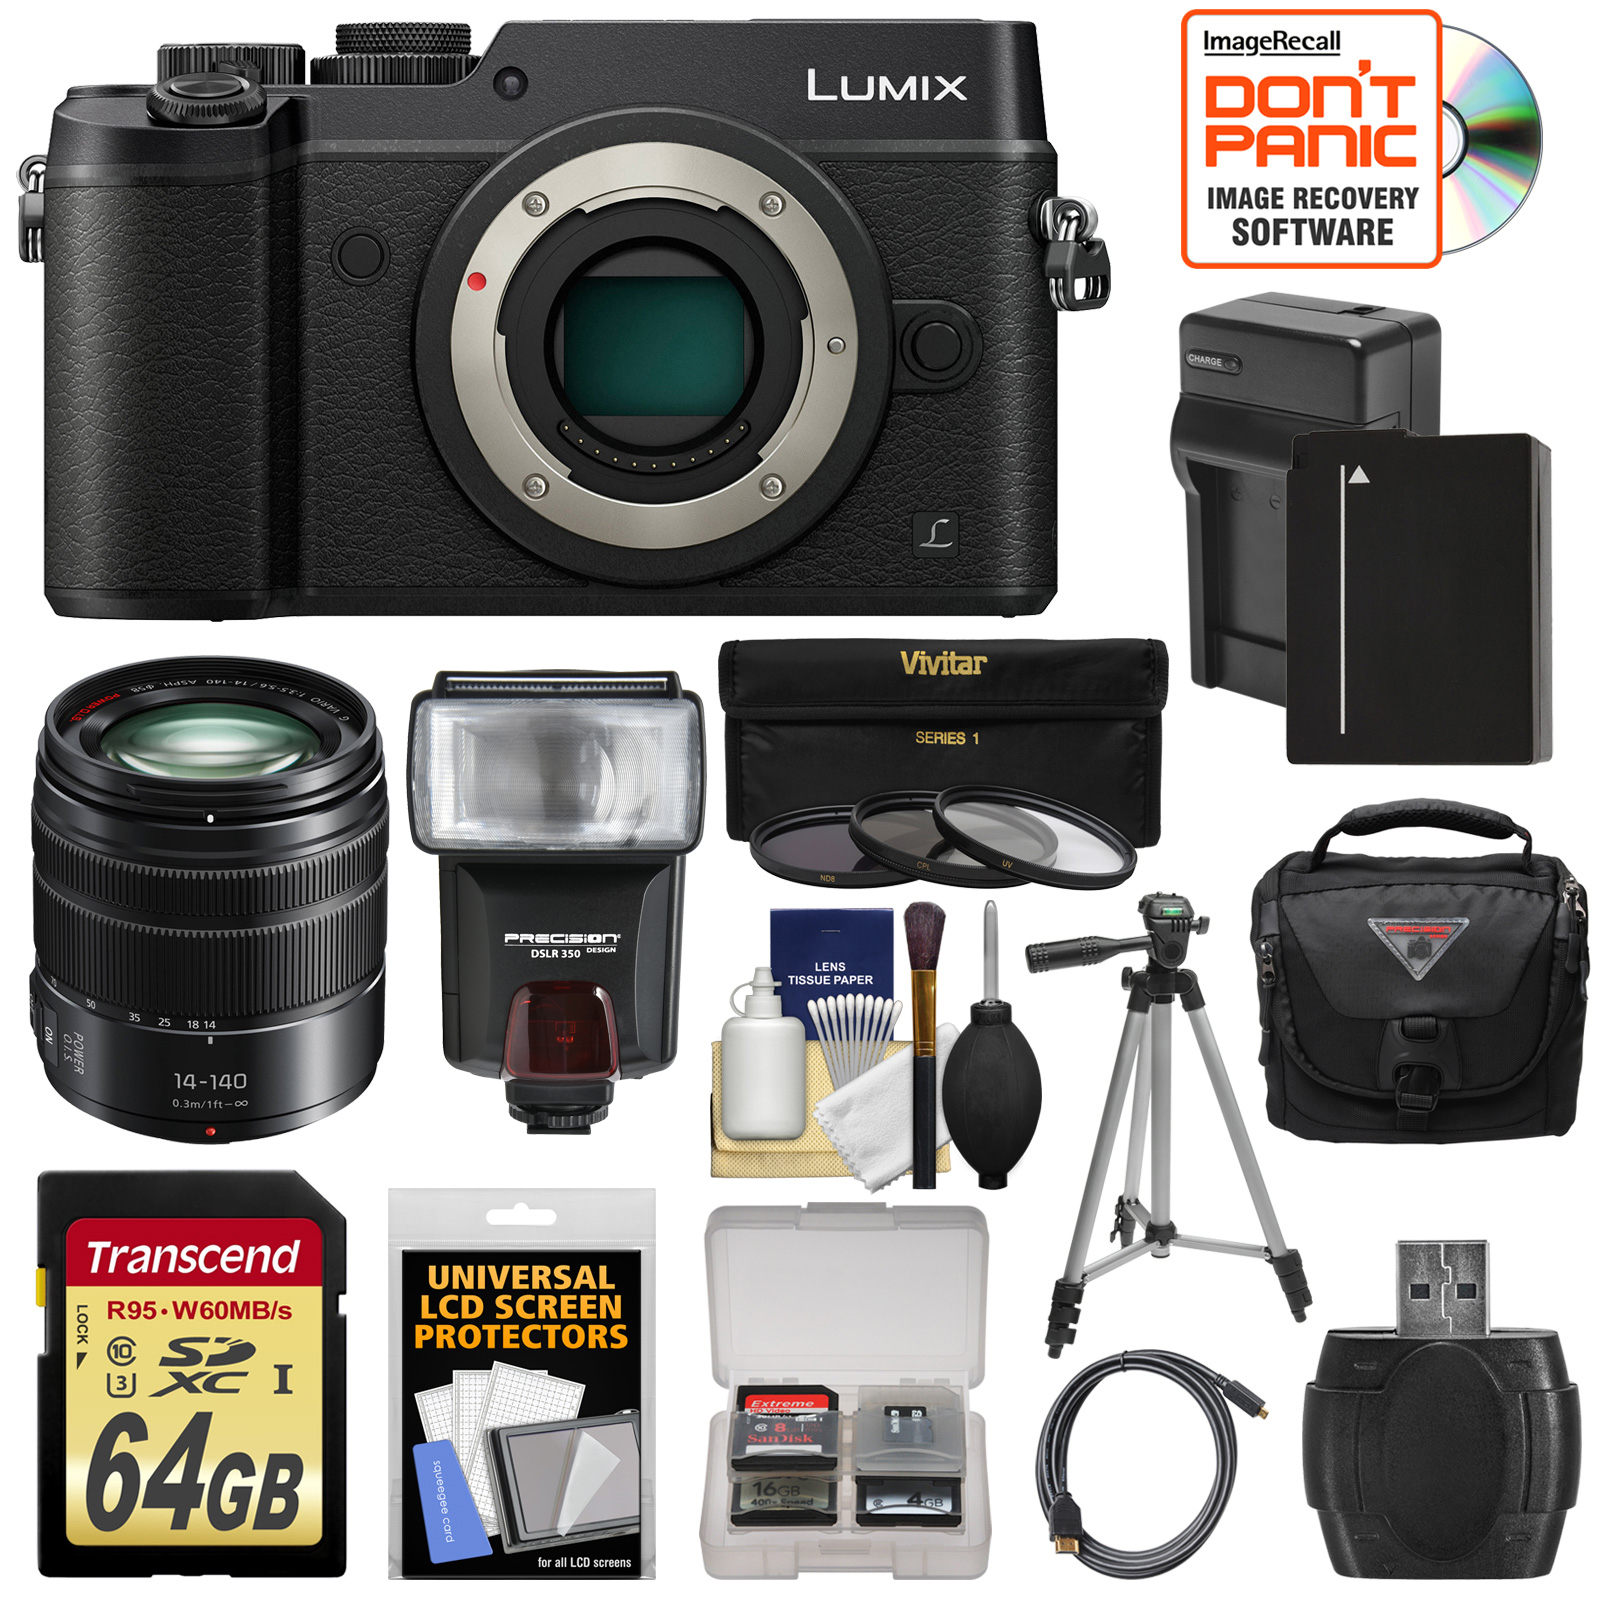 Panasonic Lumix DMC-GX8 4K Wi-Fi Digital Camera Body (Black) with 14-140mm Power OIS Lens + 64GB Card +... by Panasonic